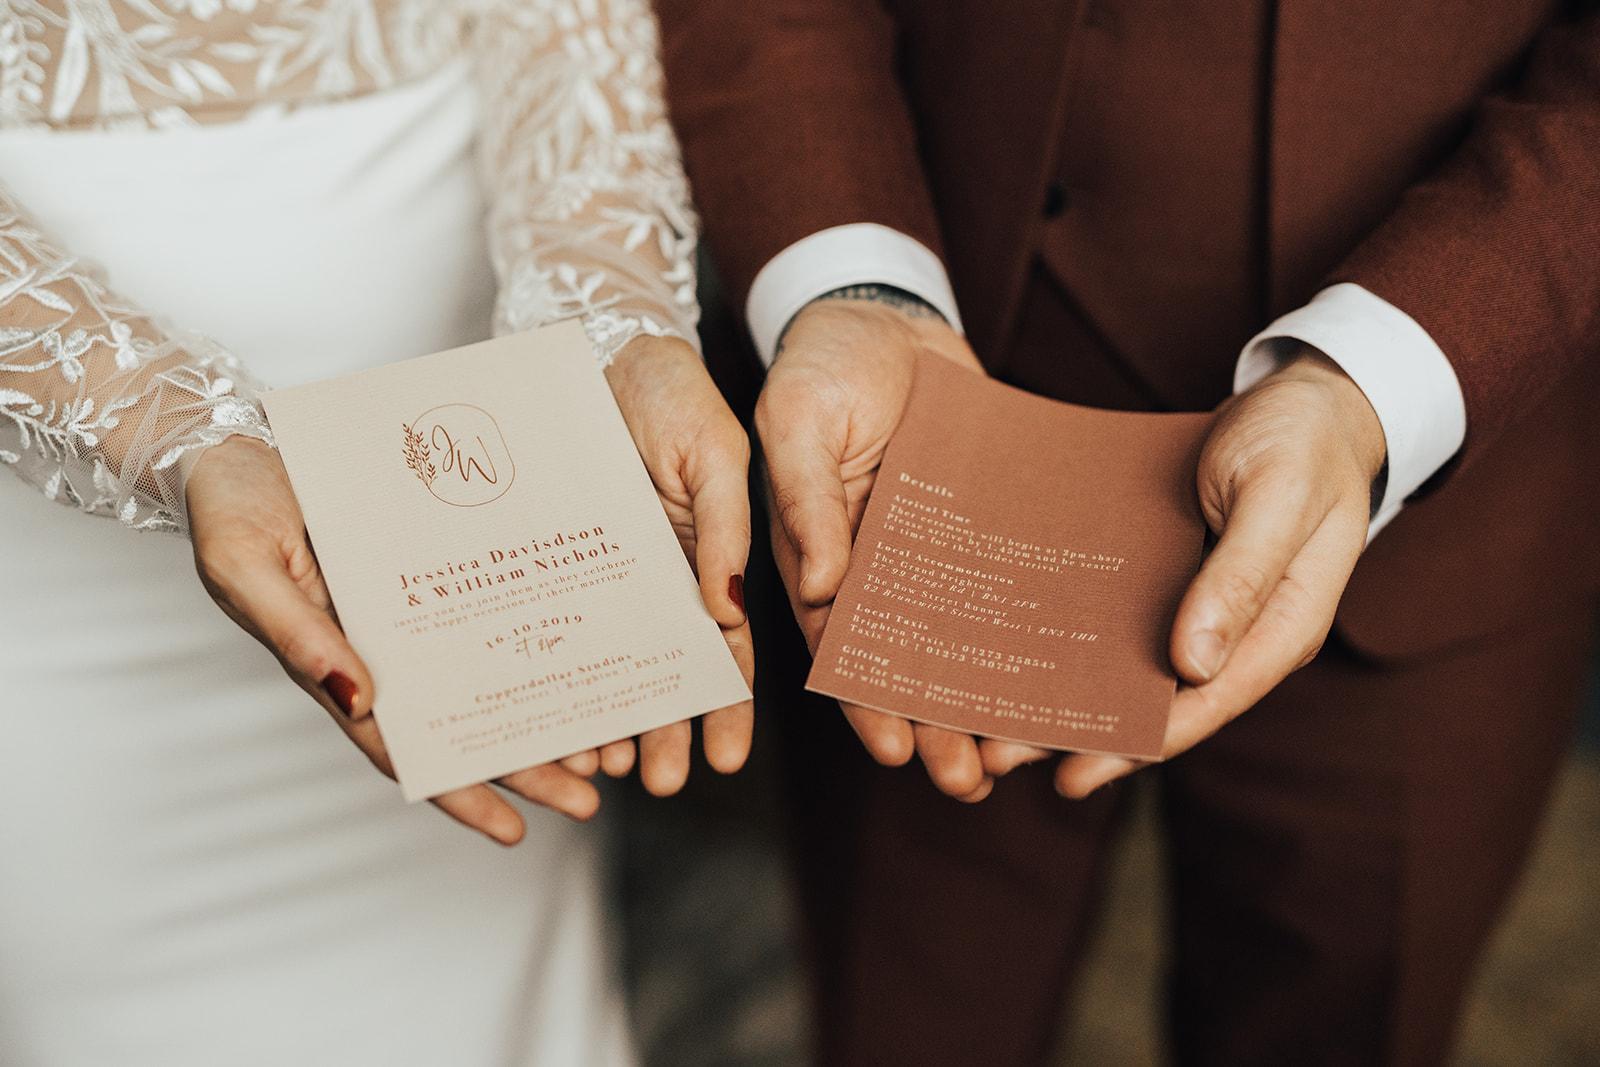 rebecca carpenter photography stationery wedding invitations invites menus signage